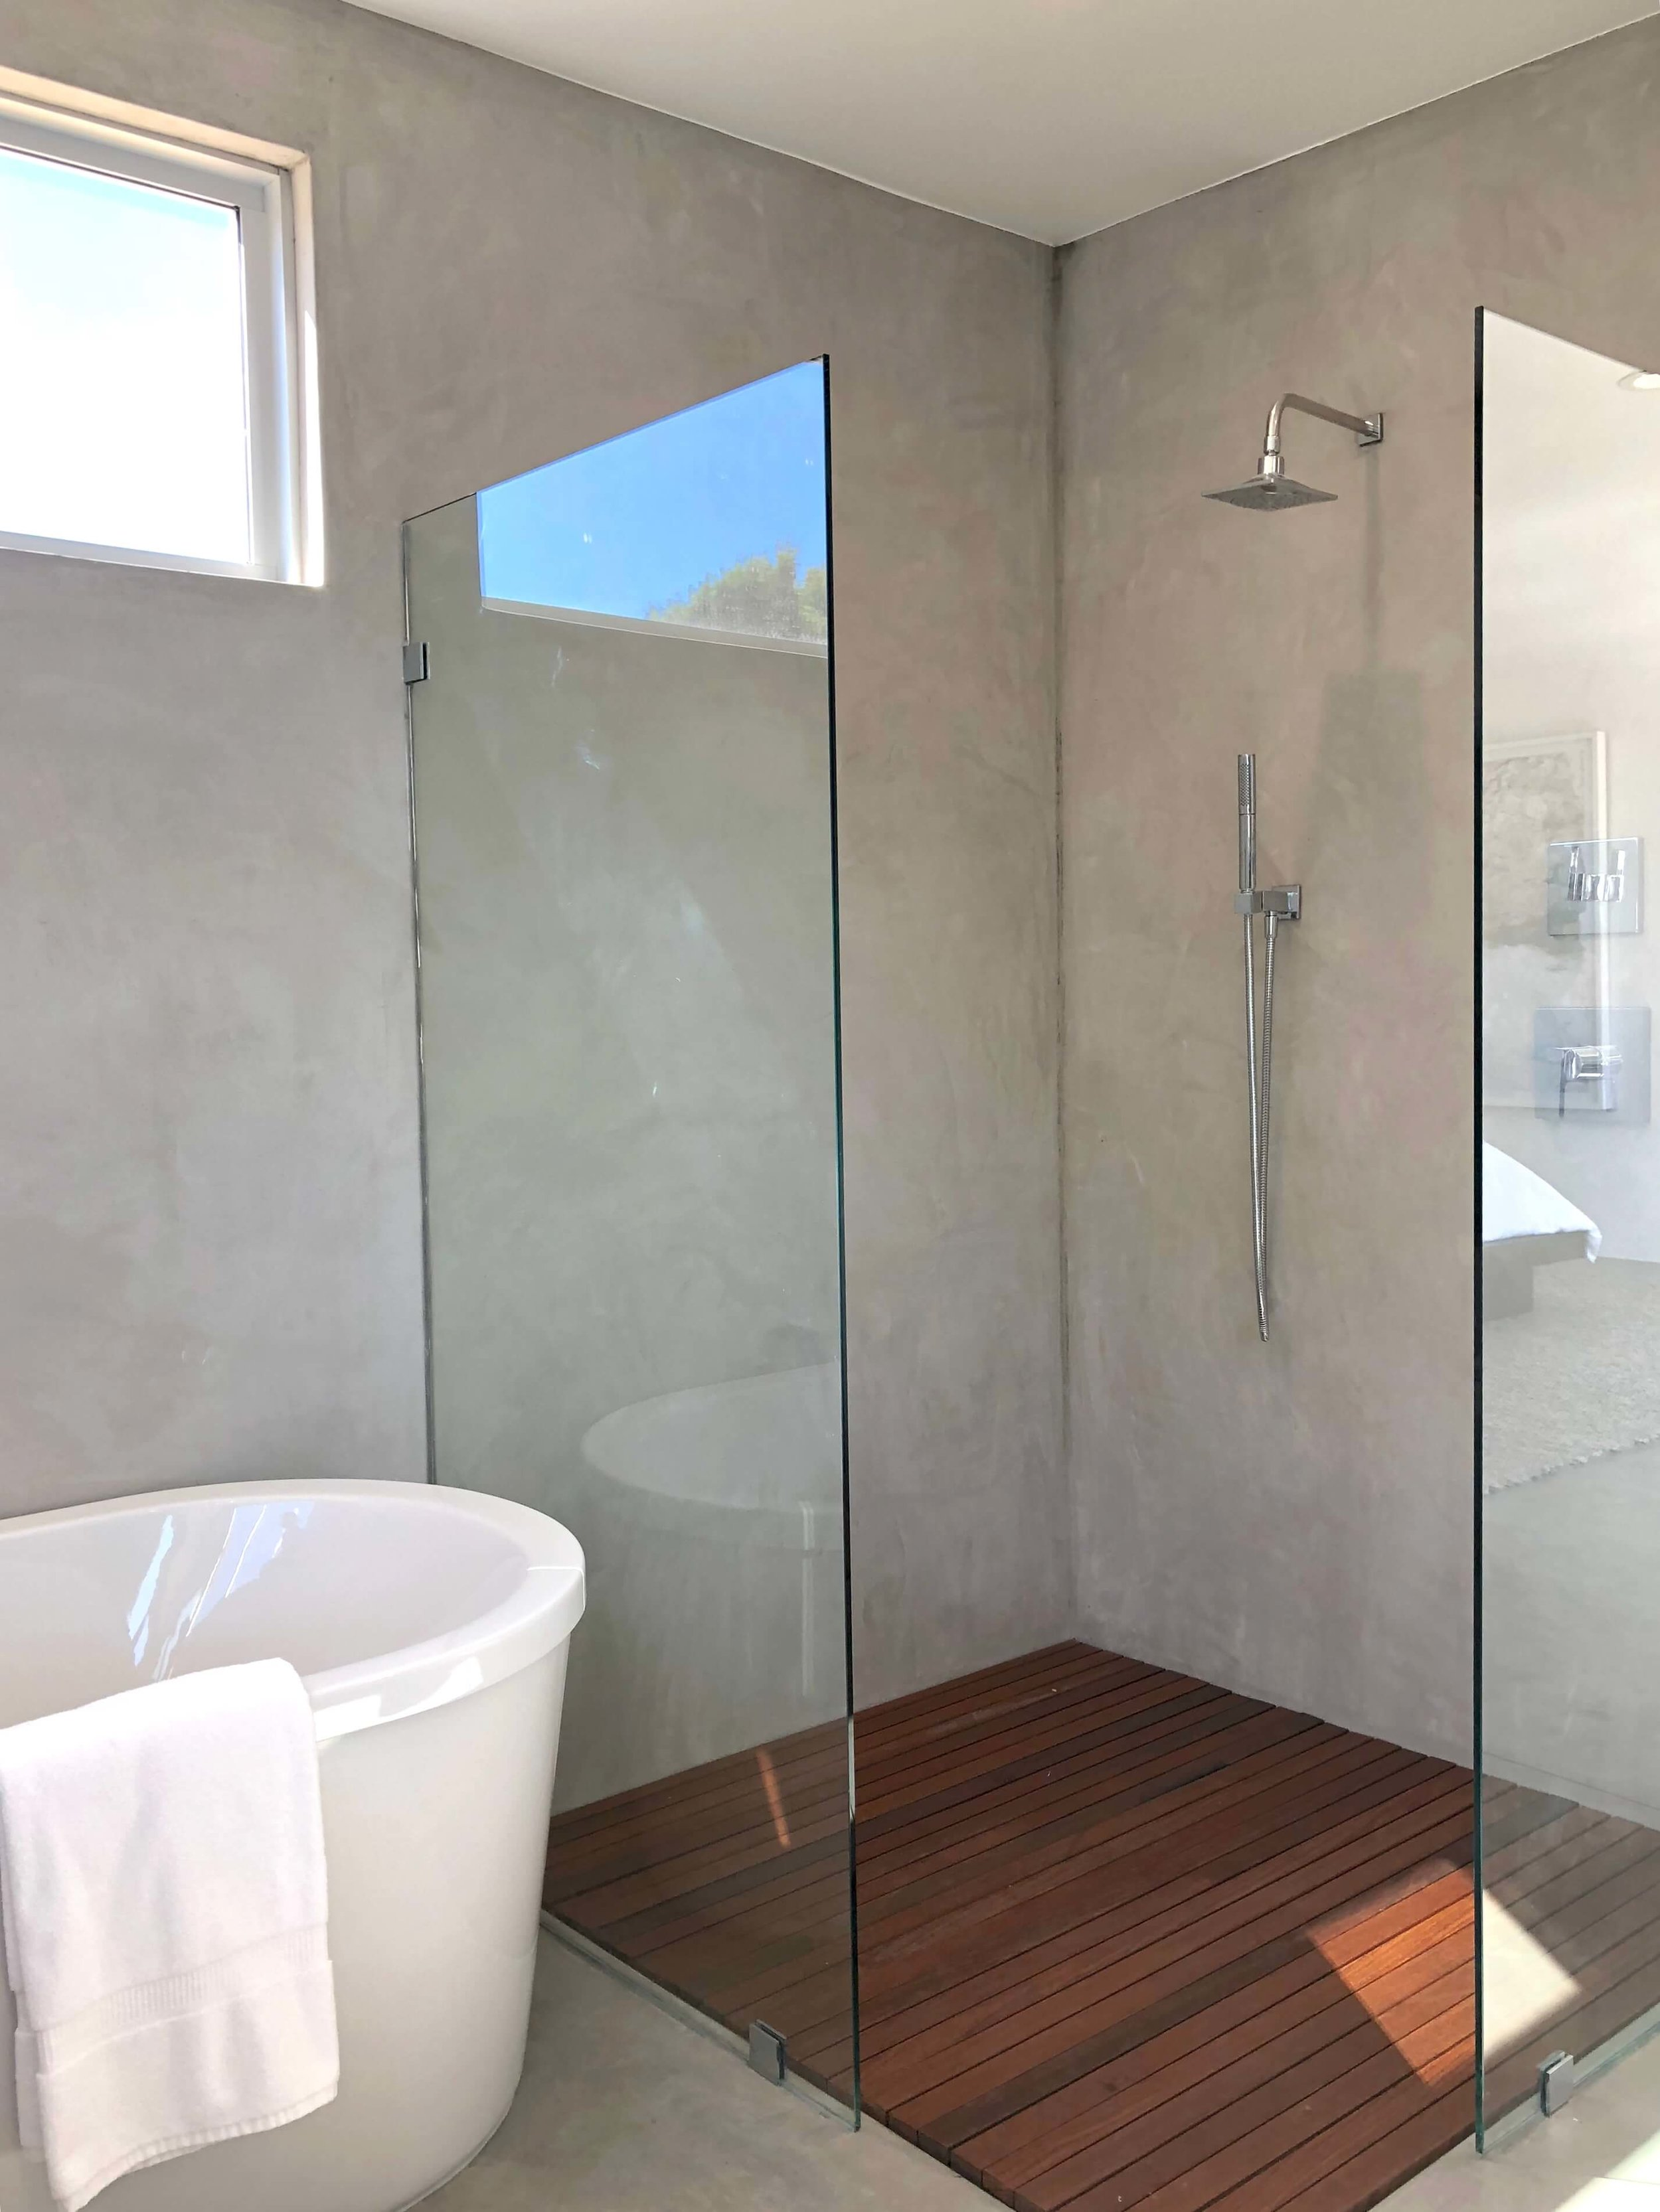 California contemporary design - Dwell on Design's Fall Home Tour, Designer: Vitus Mitare #contemporaryarchitecture #venetianplaster #shower